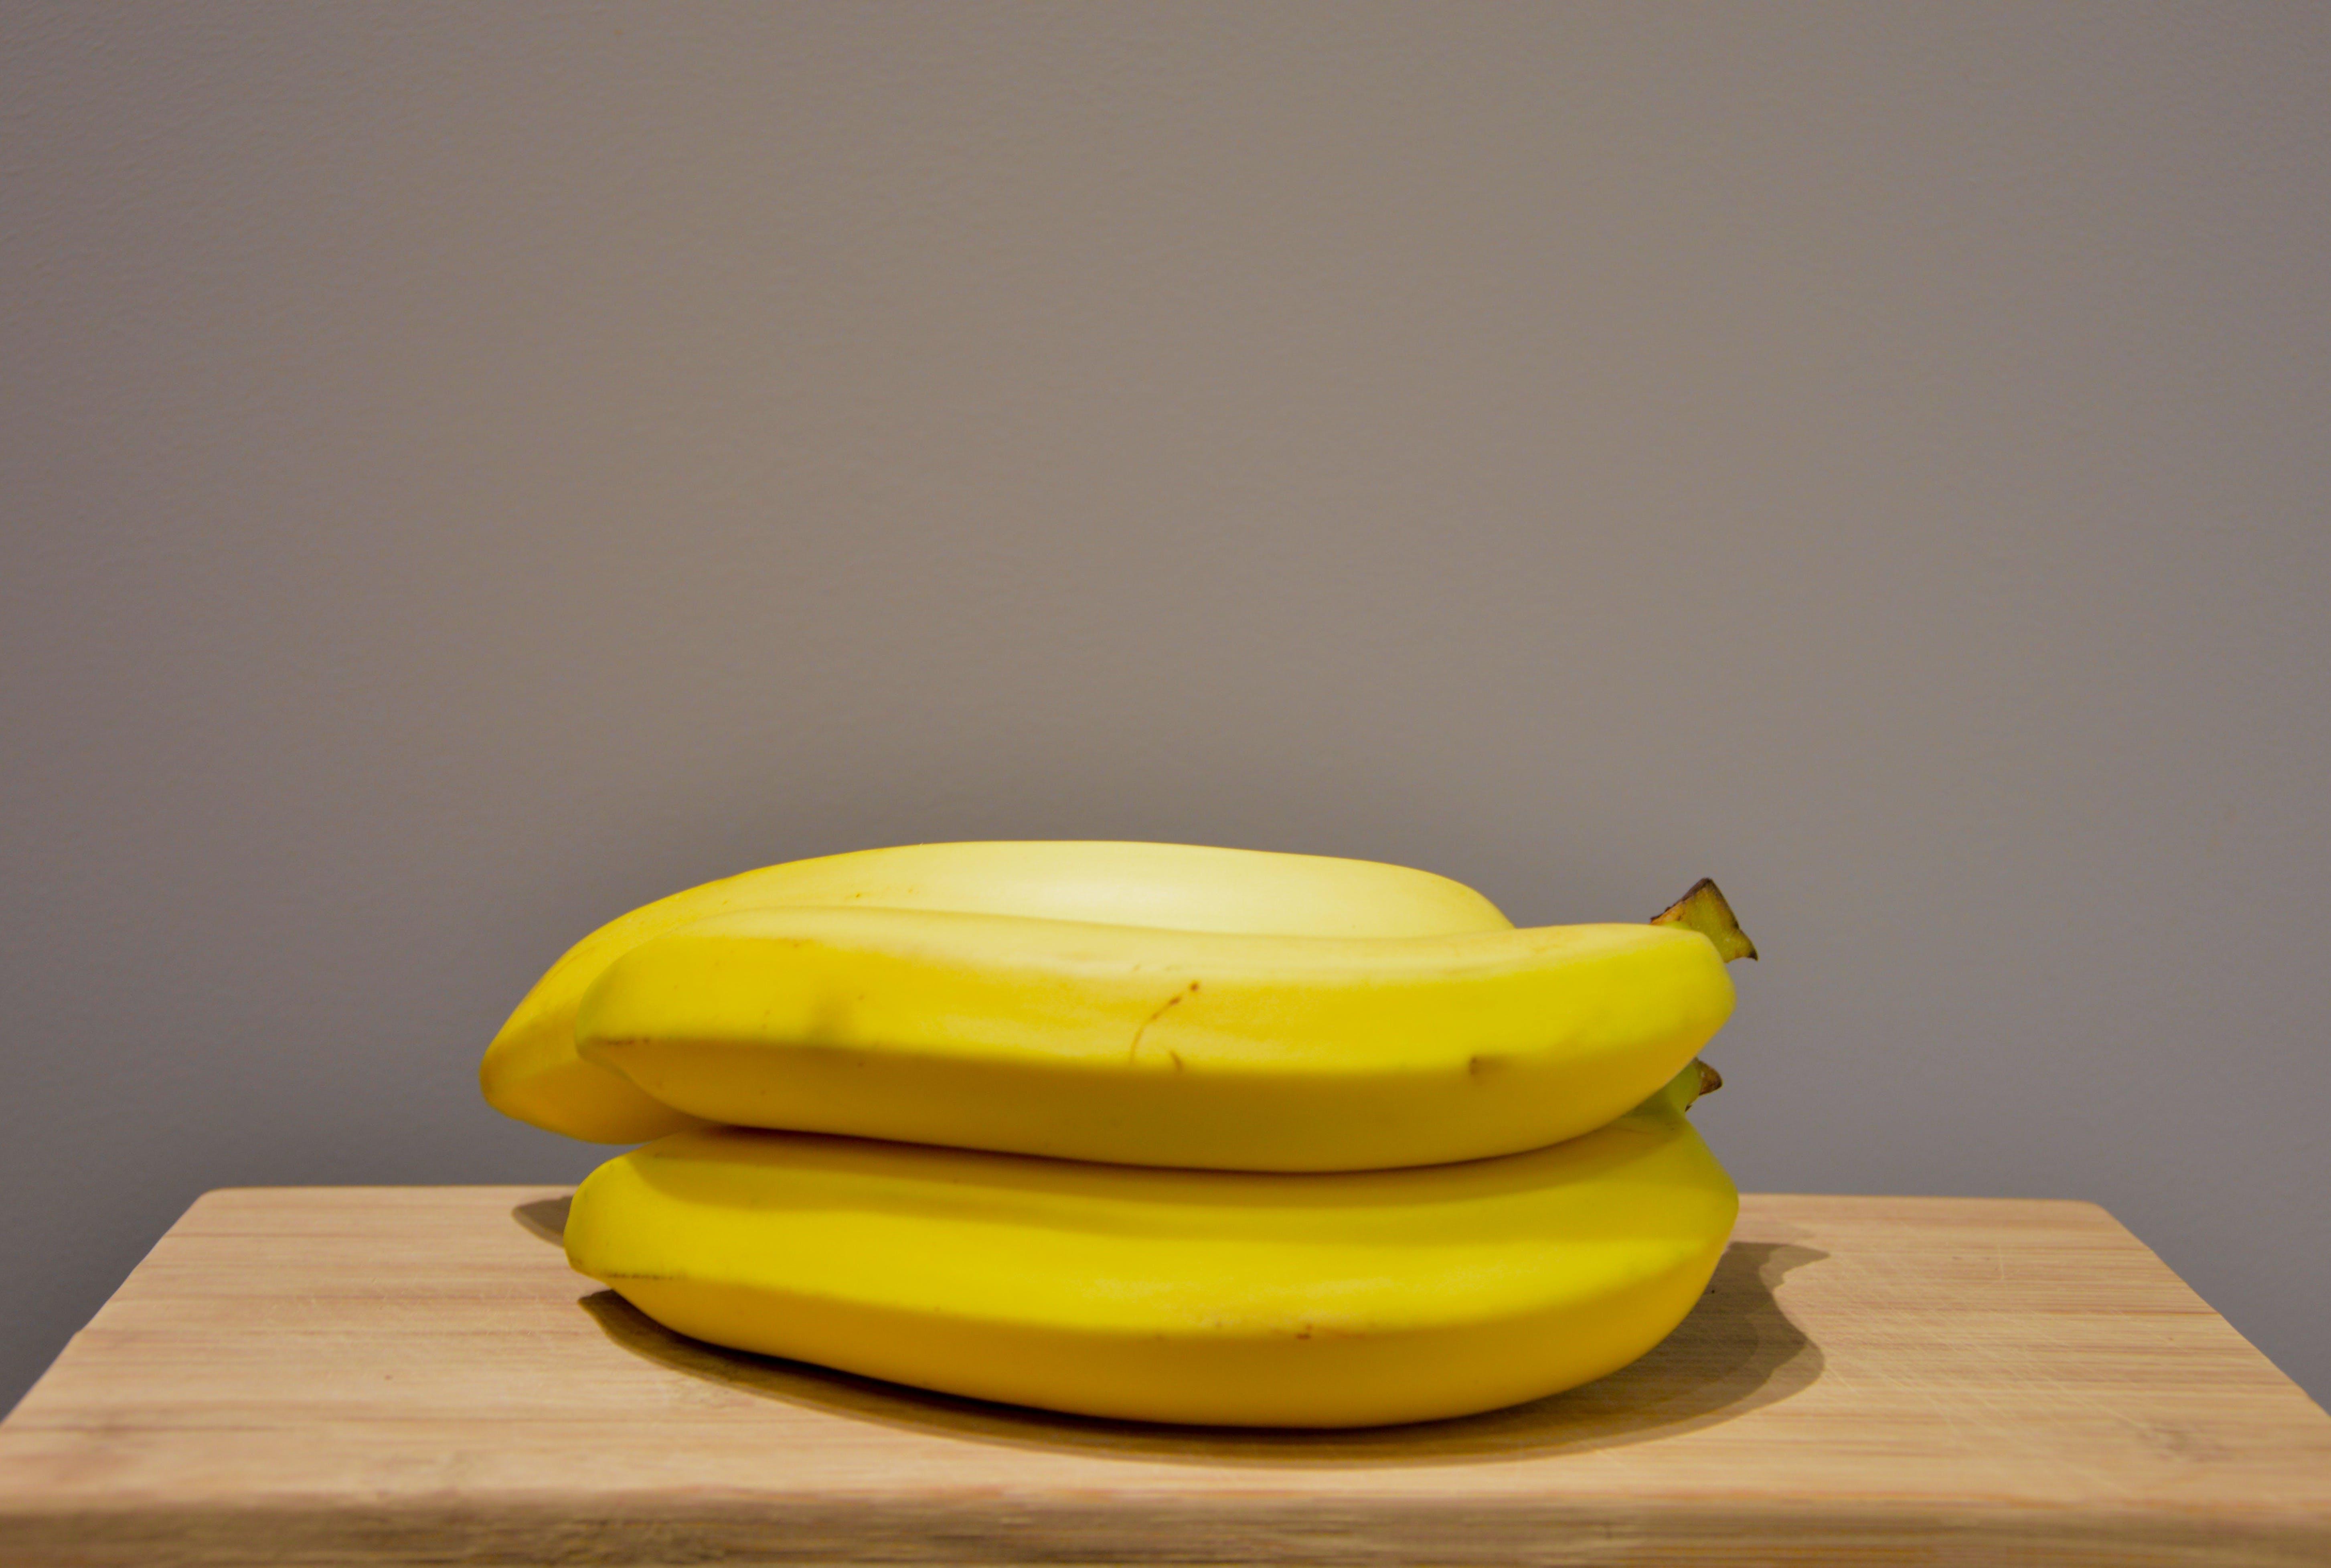 Yellow Bananas on an Oak Wood Table